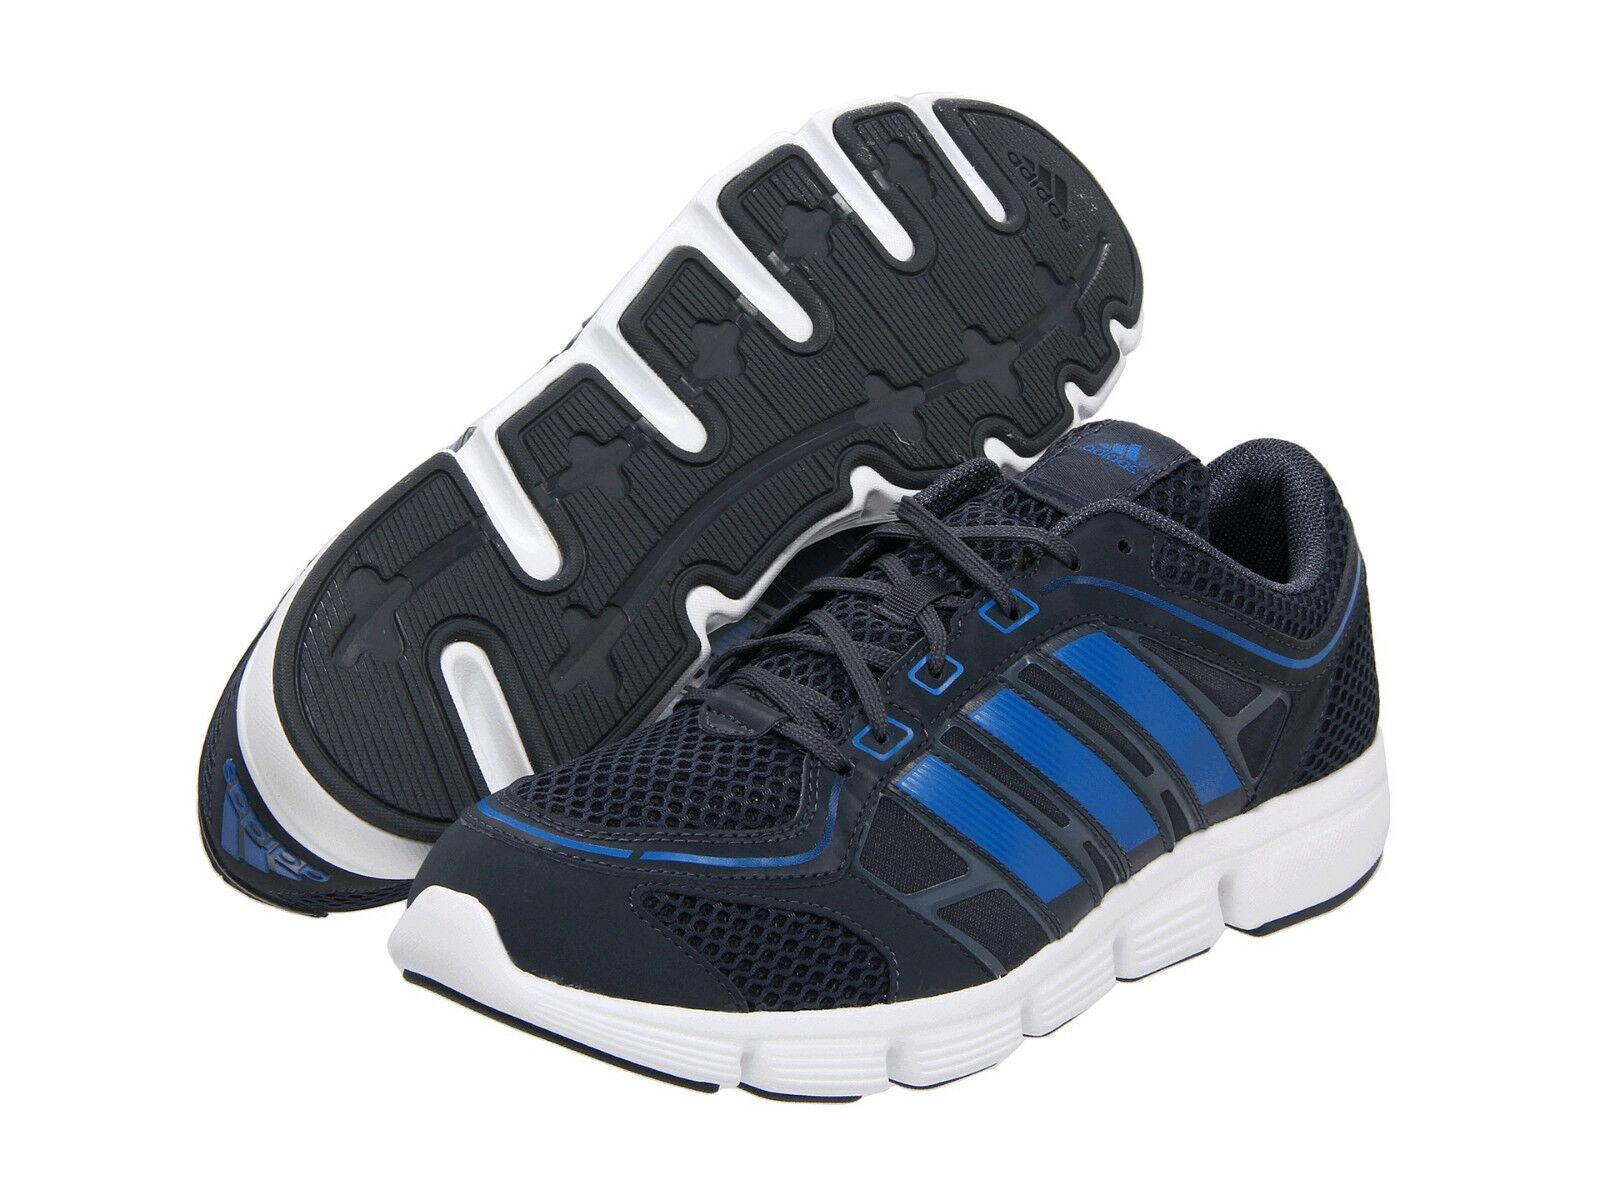 big sale a8414 bf946 New adidas Running Jett Breeze Breeze Breeze Running Training Blue Shoes  Sneakers Men 13 8d17fc